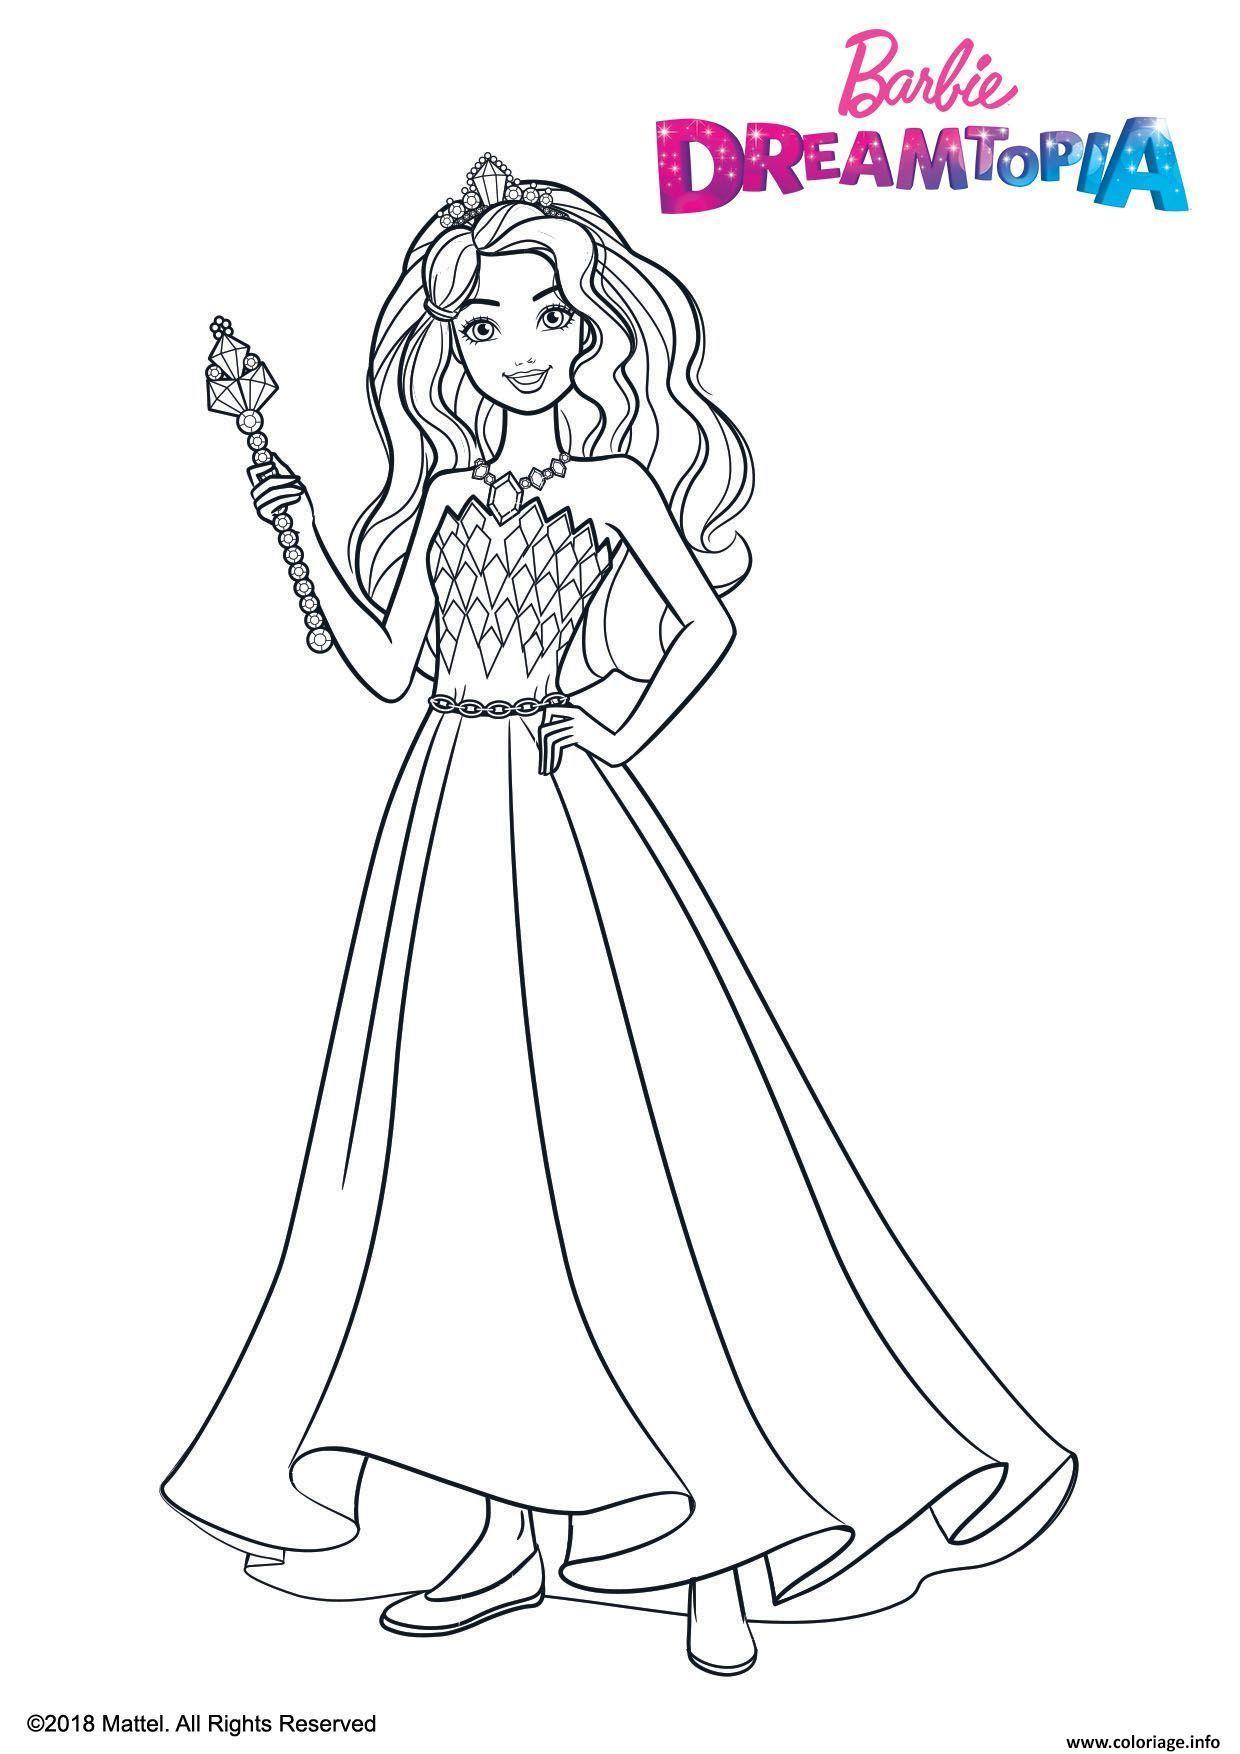 Coloriage Barbie Princesse Fille Dreamtopia Dessin Gulli A Imprimer